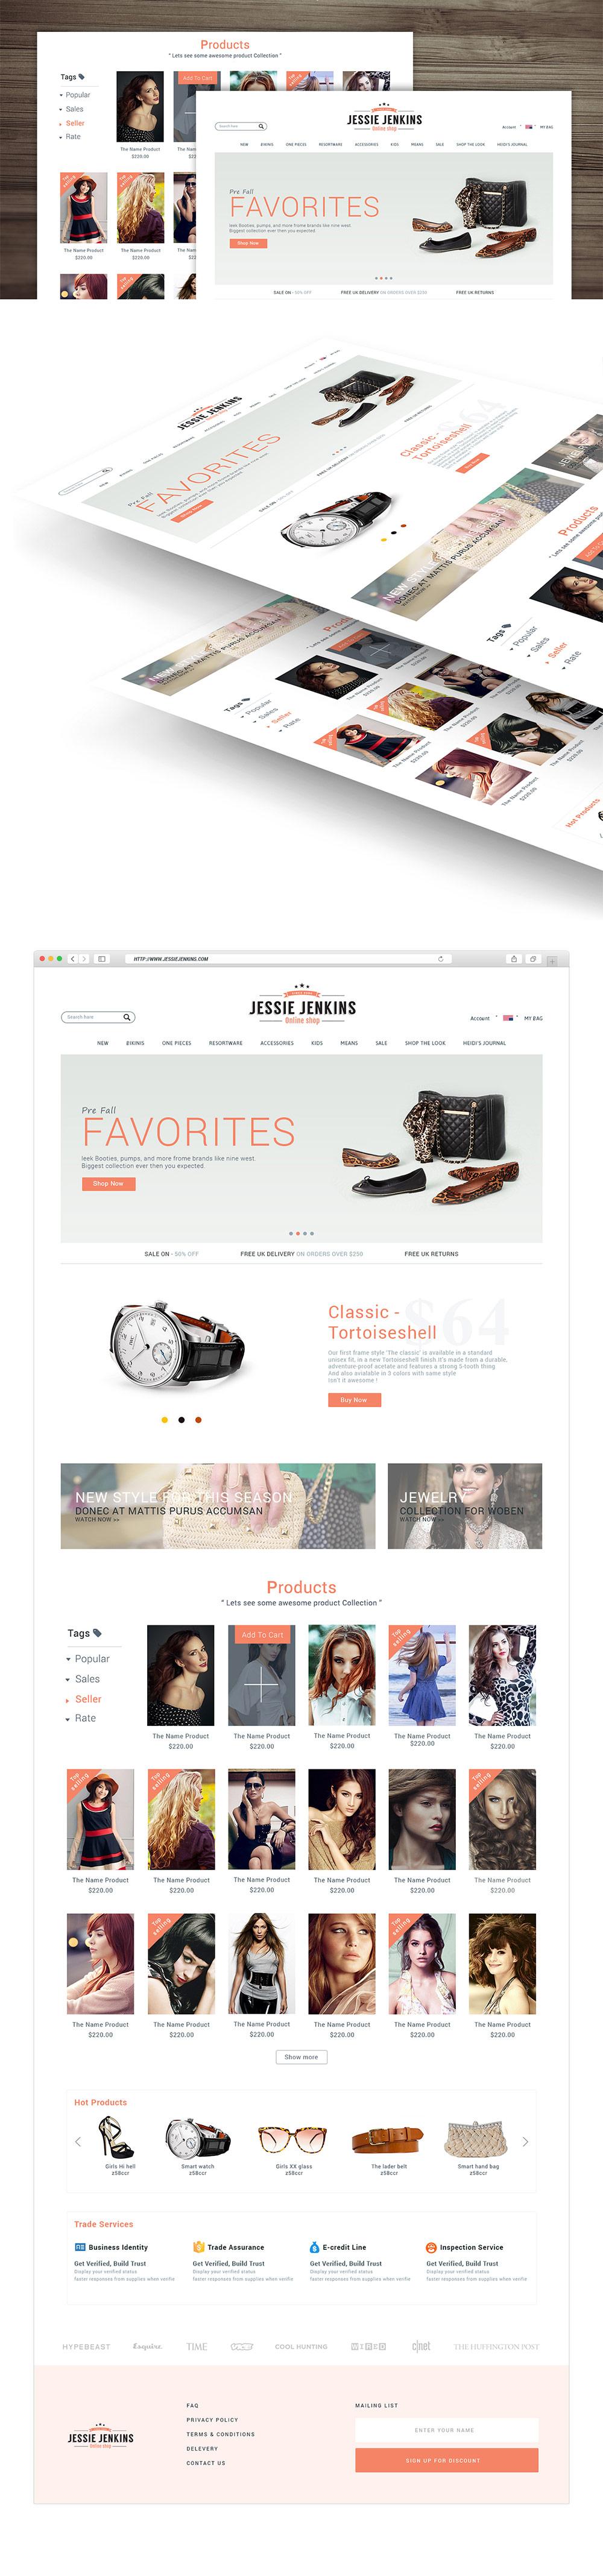 Modern Premium eCommerce Website Free PSD Template Download ...